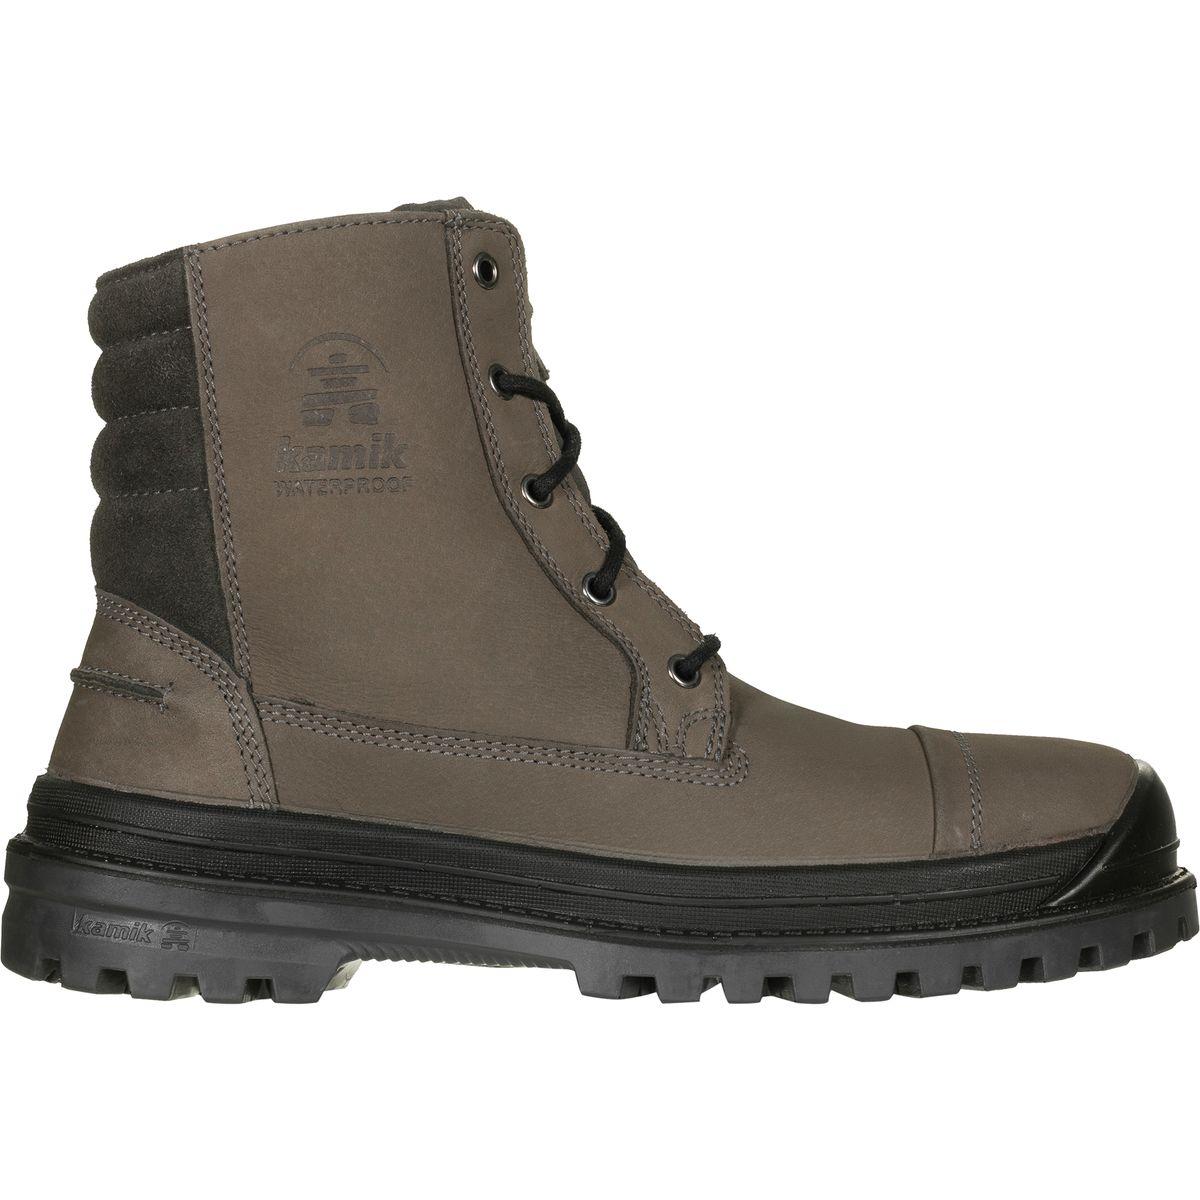 Gentleman/Lady Kamik Griffon Winter Boot a - Men's fashion Has a Boot long reputation Personalization trend ff28bd